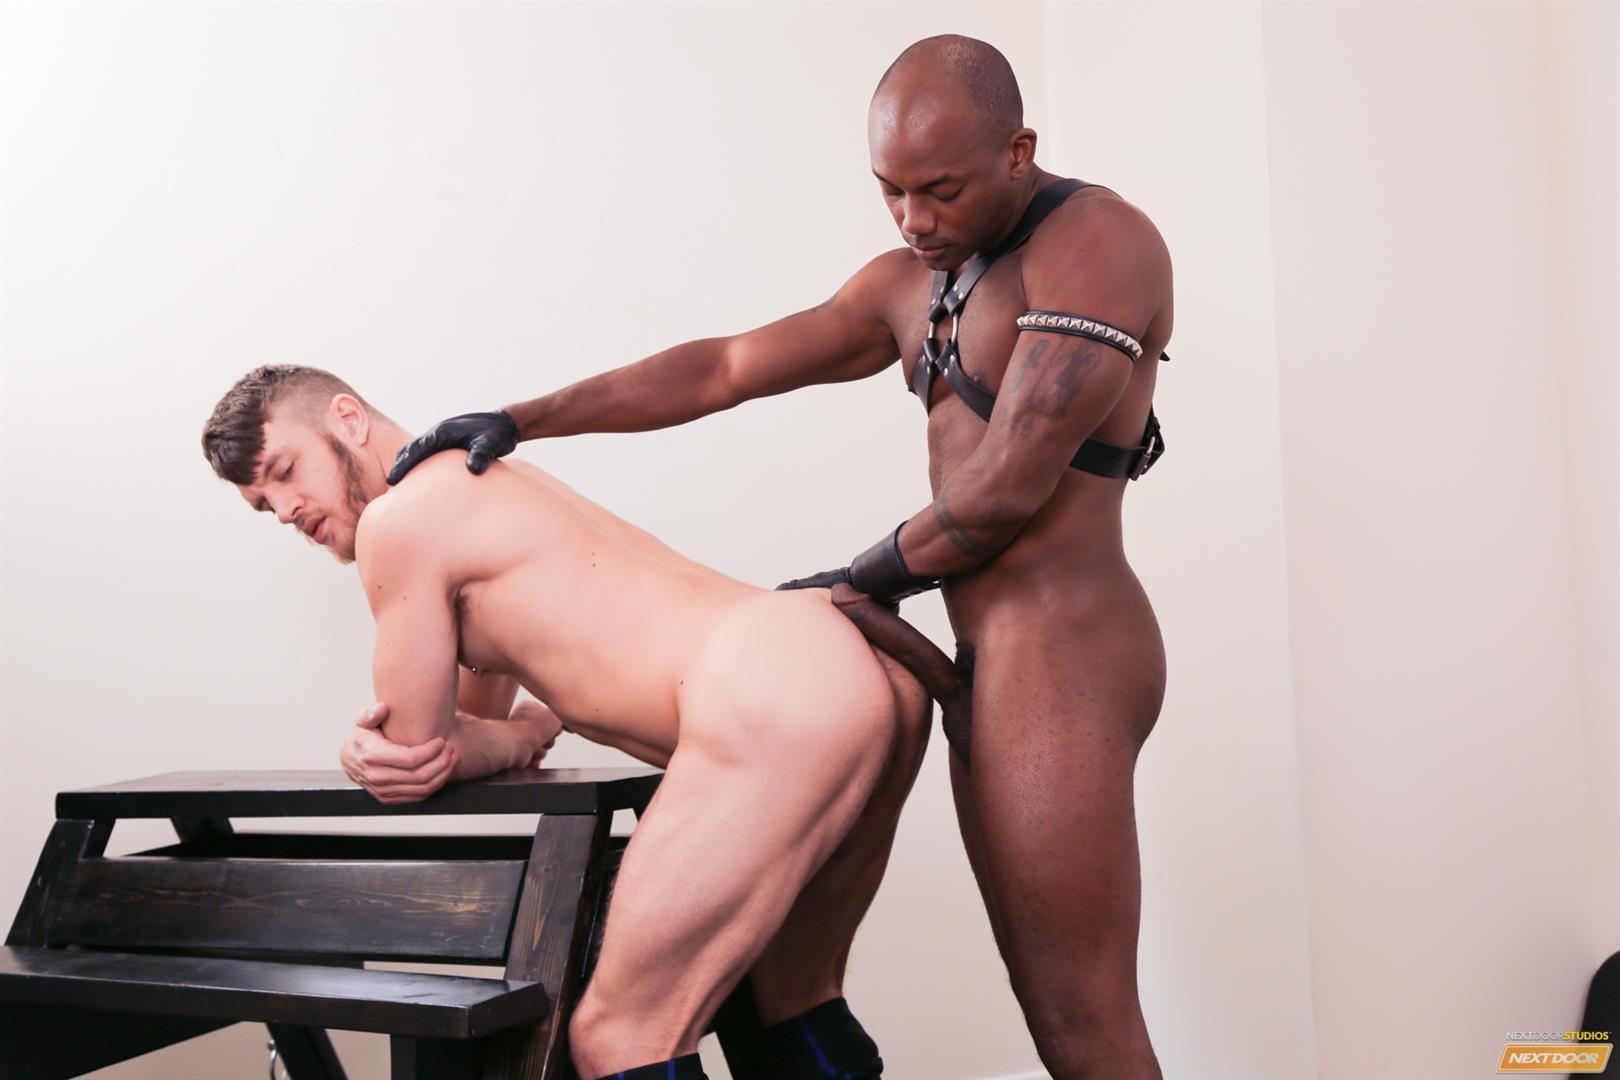 Next Door Ebony Osiris Blade and Caleb King Big Black Cock In White Ass Amateur Gay Porn 14